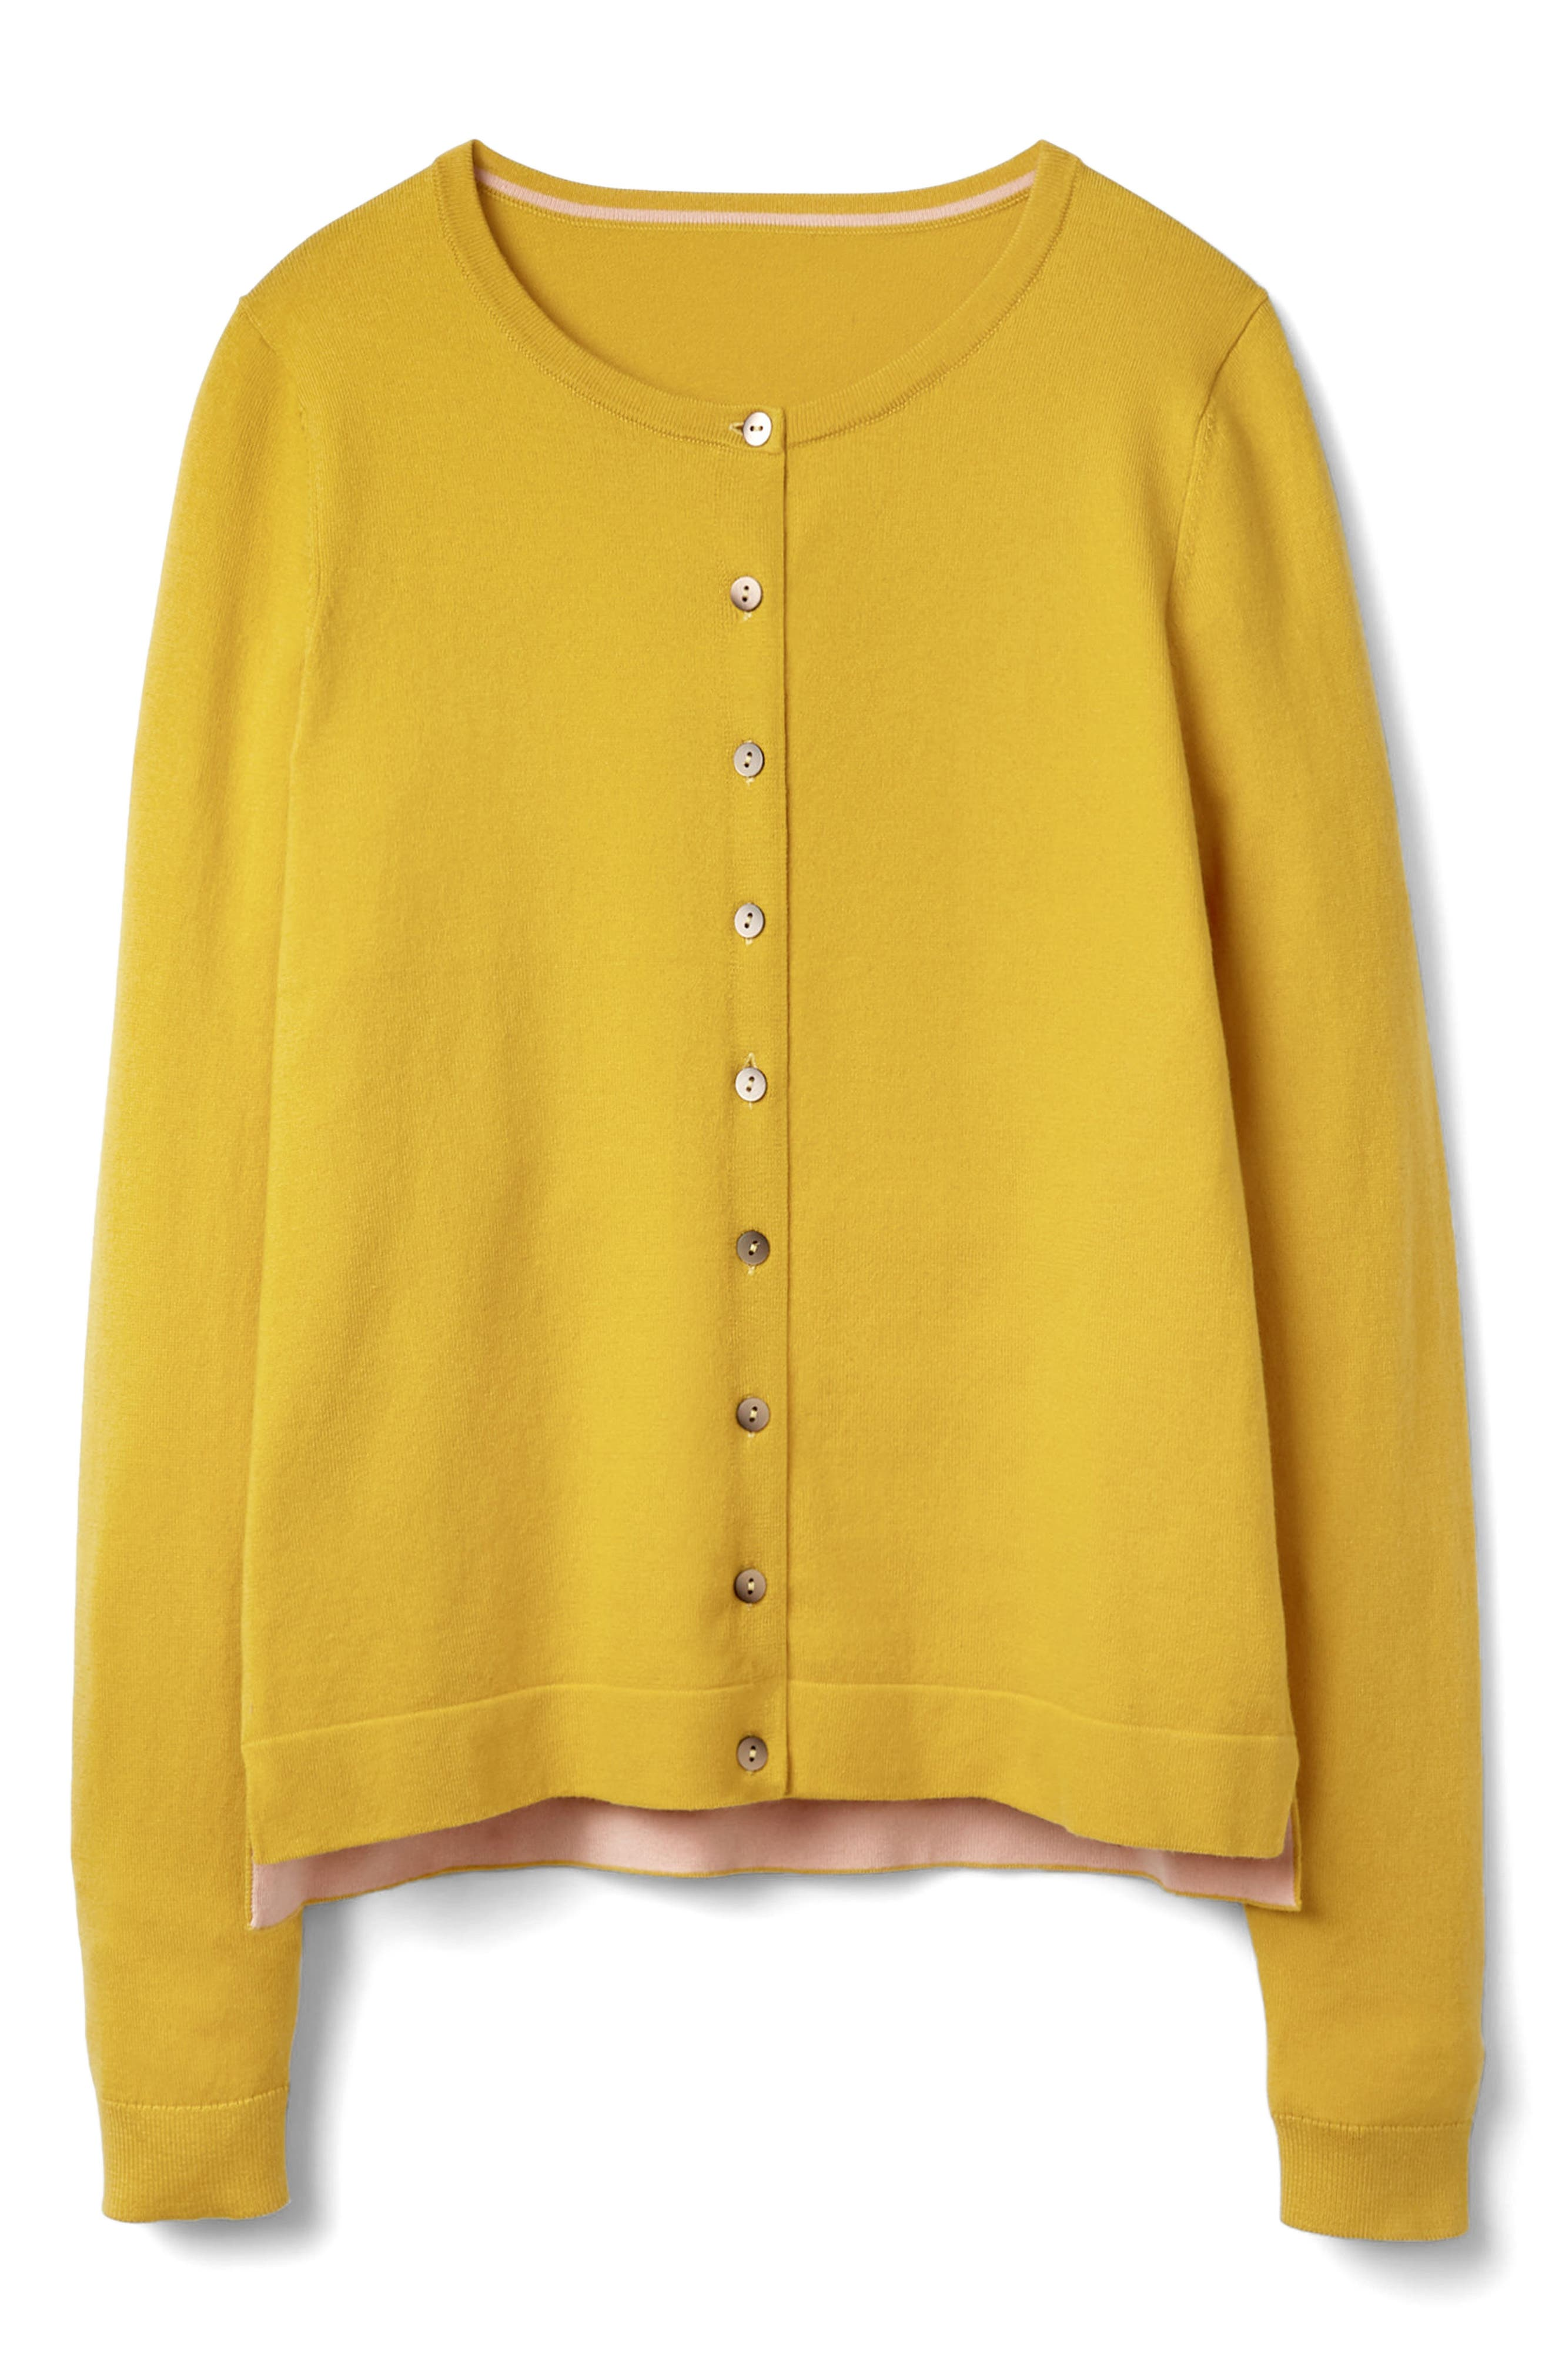 Crewneck Cardigan,                             Alternate thumbnail 6, color,                             Mimosa Yellow